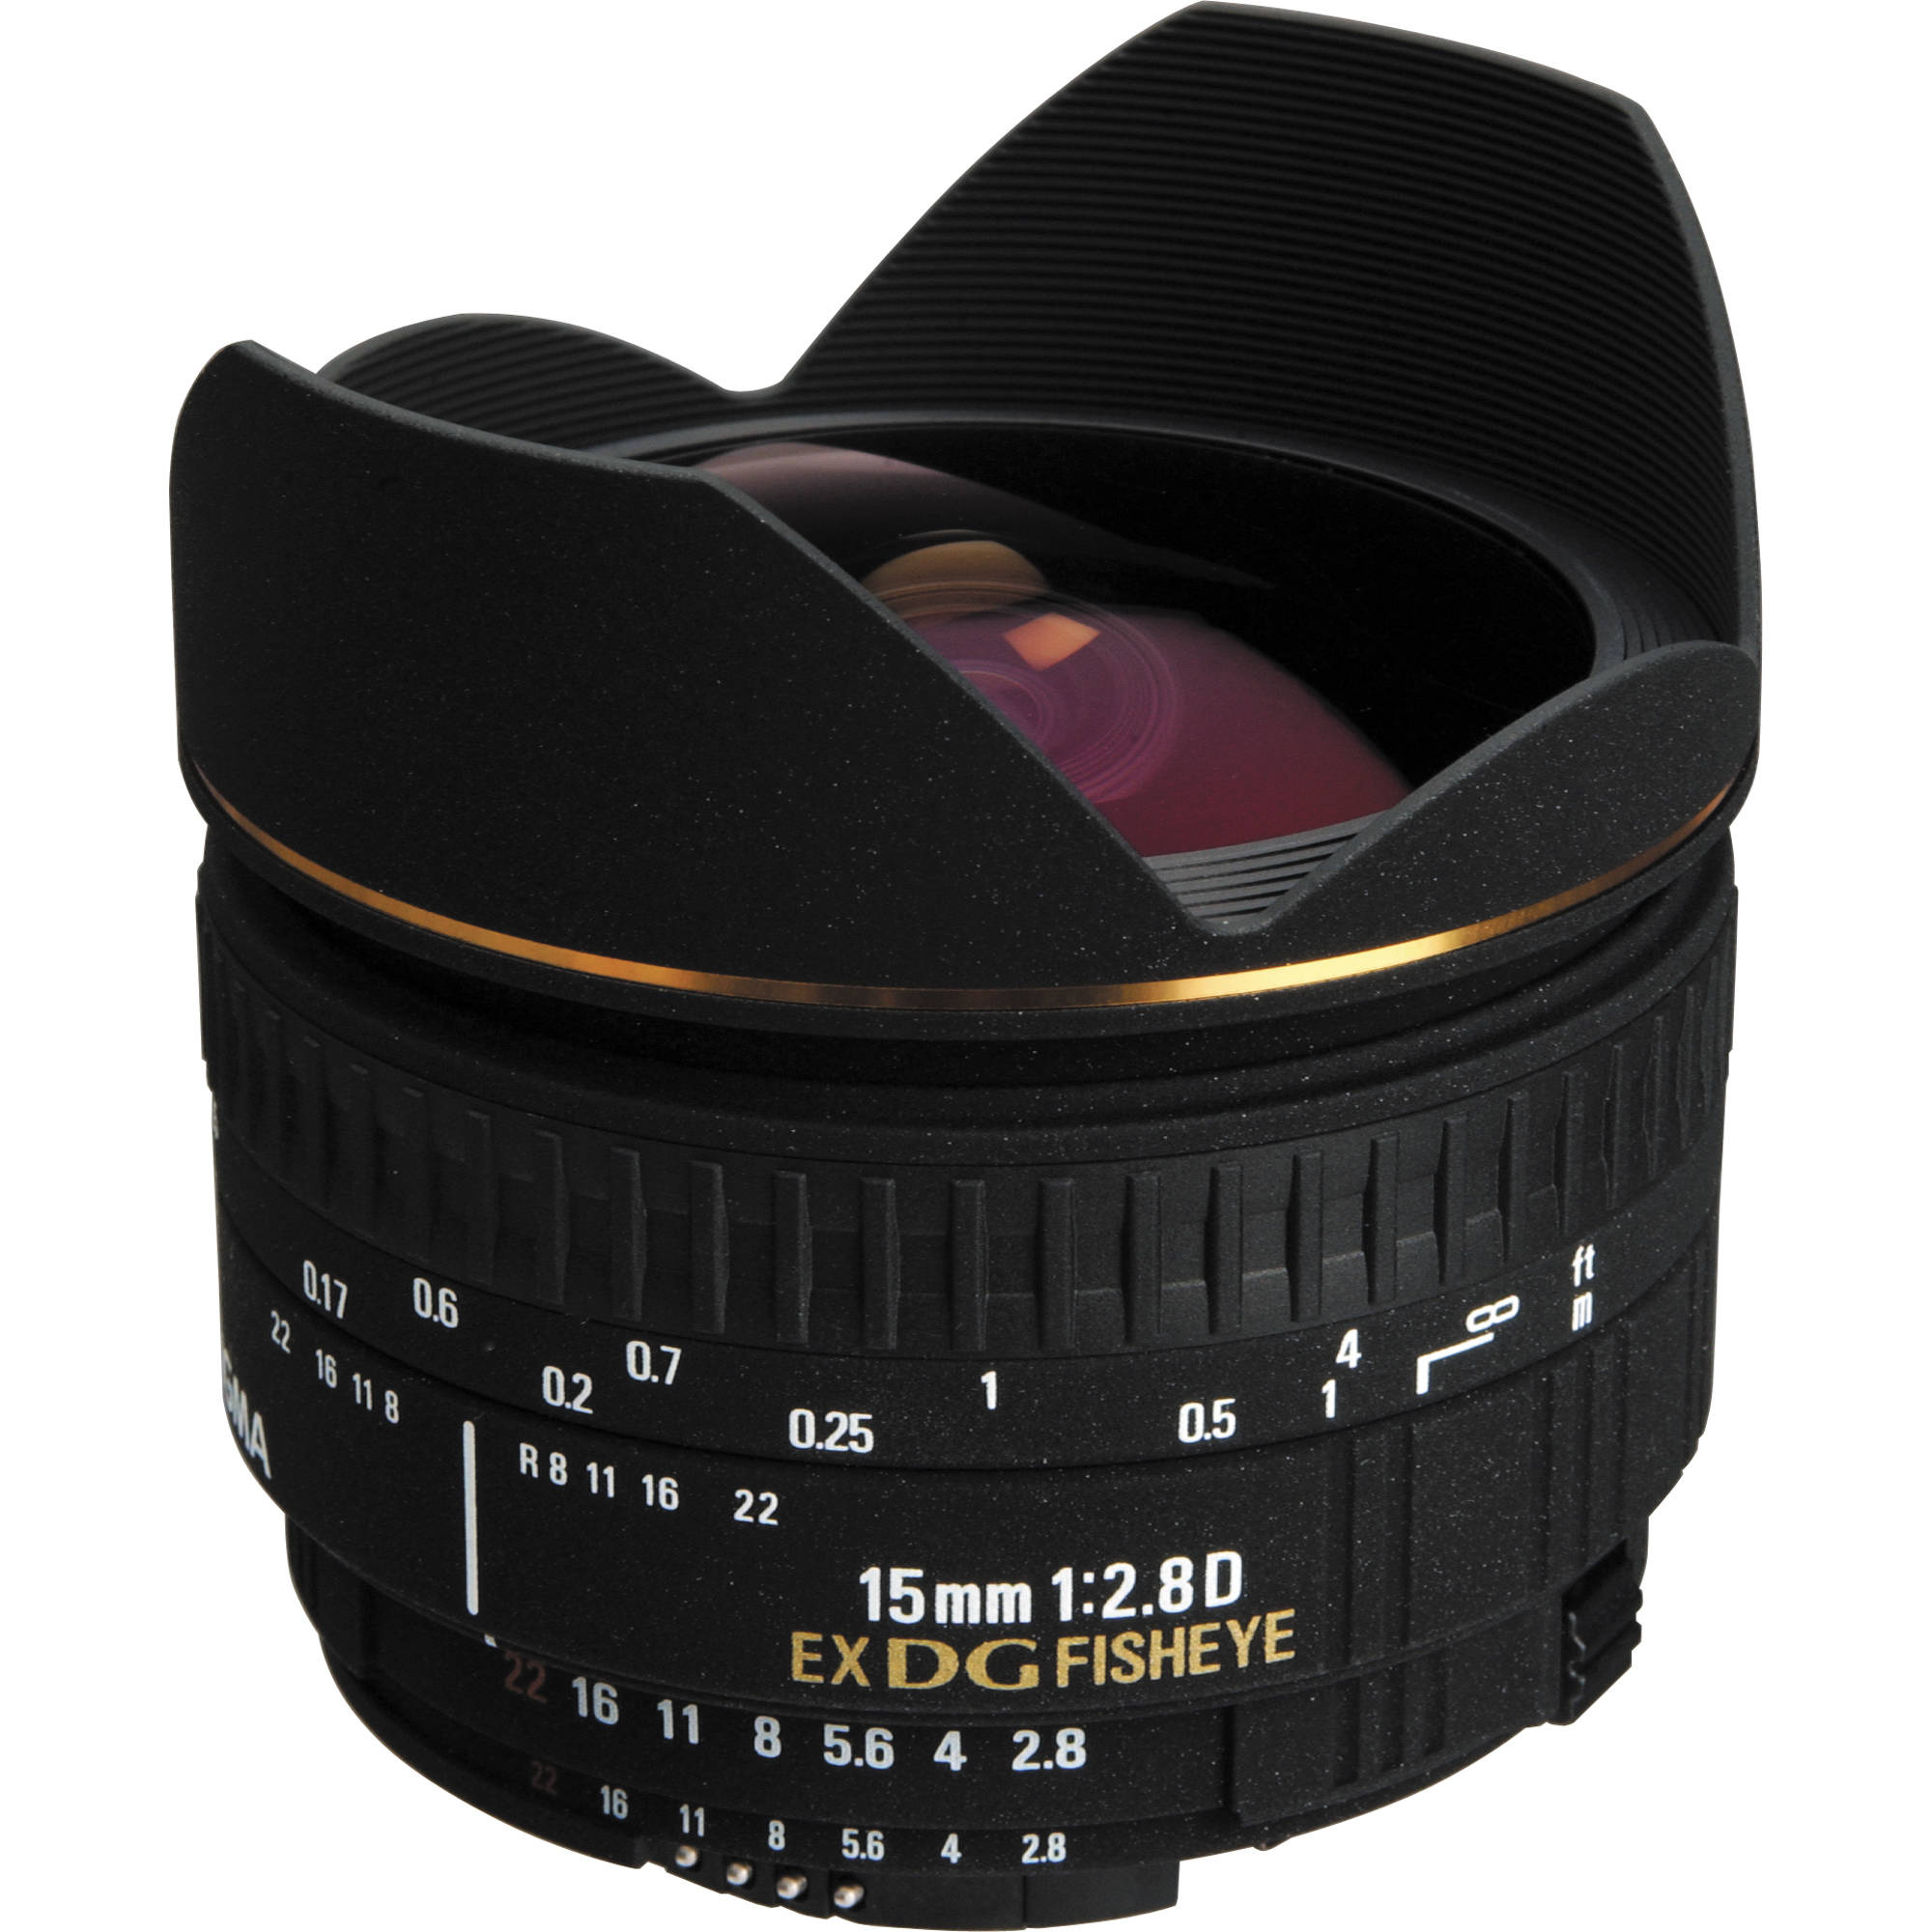 Sigma 15mm f/2.8 EX DG Diagonal Fisheye Autofocus Lens for Canon EOS